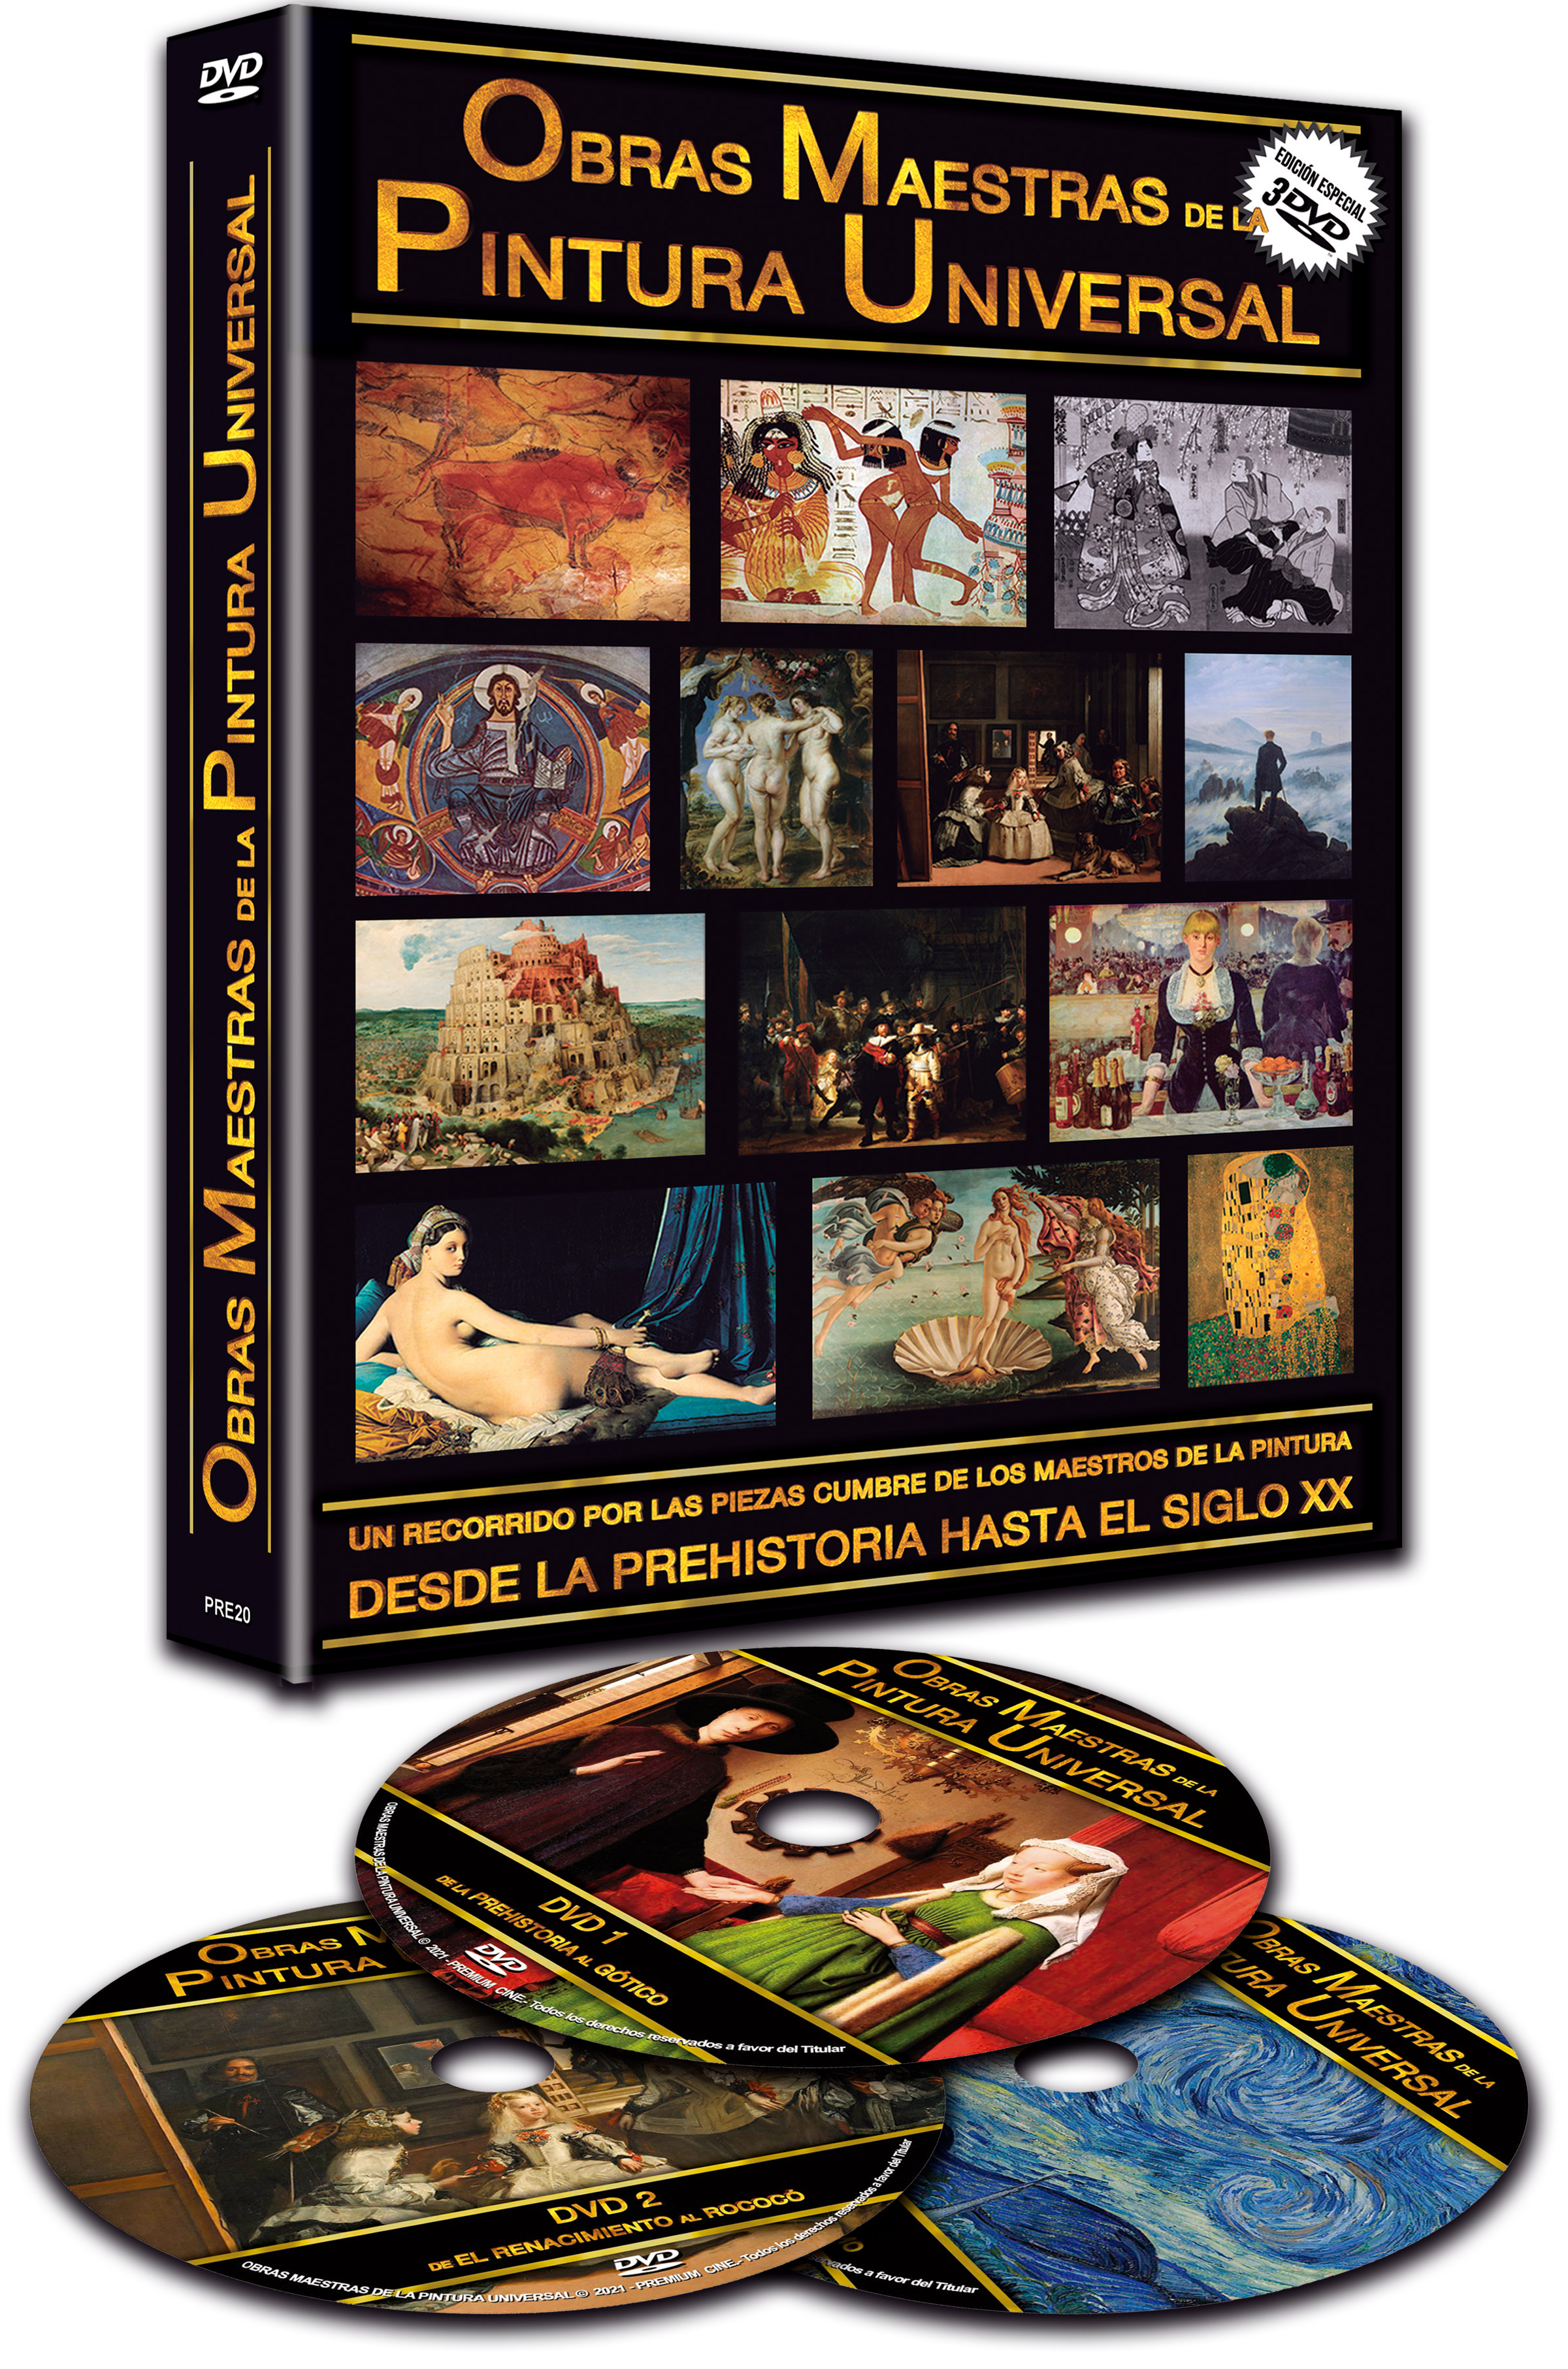 OBRAS_MAESTRAS_troquel-DVD-3D-y-discos